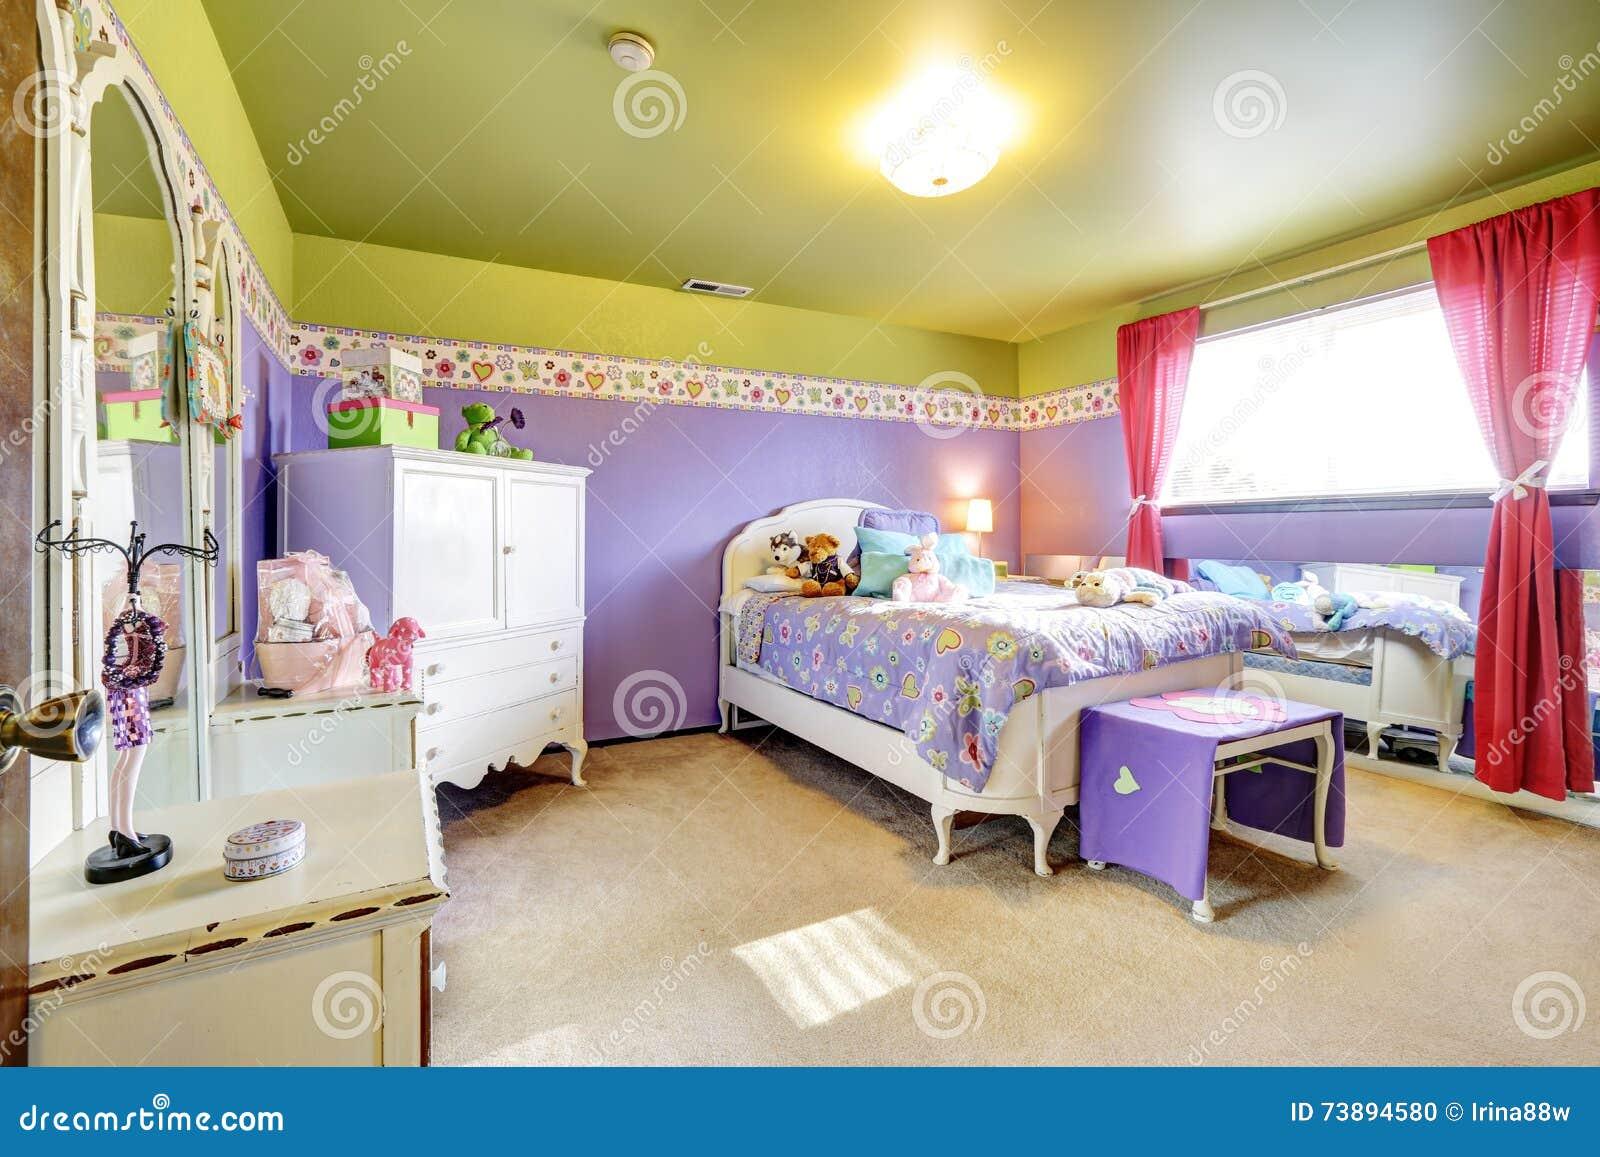 Girls Children Purple And Green Bedroom With Mirror Stock ...